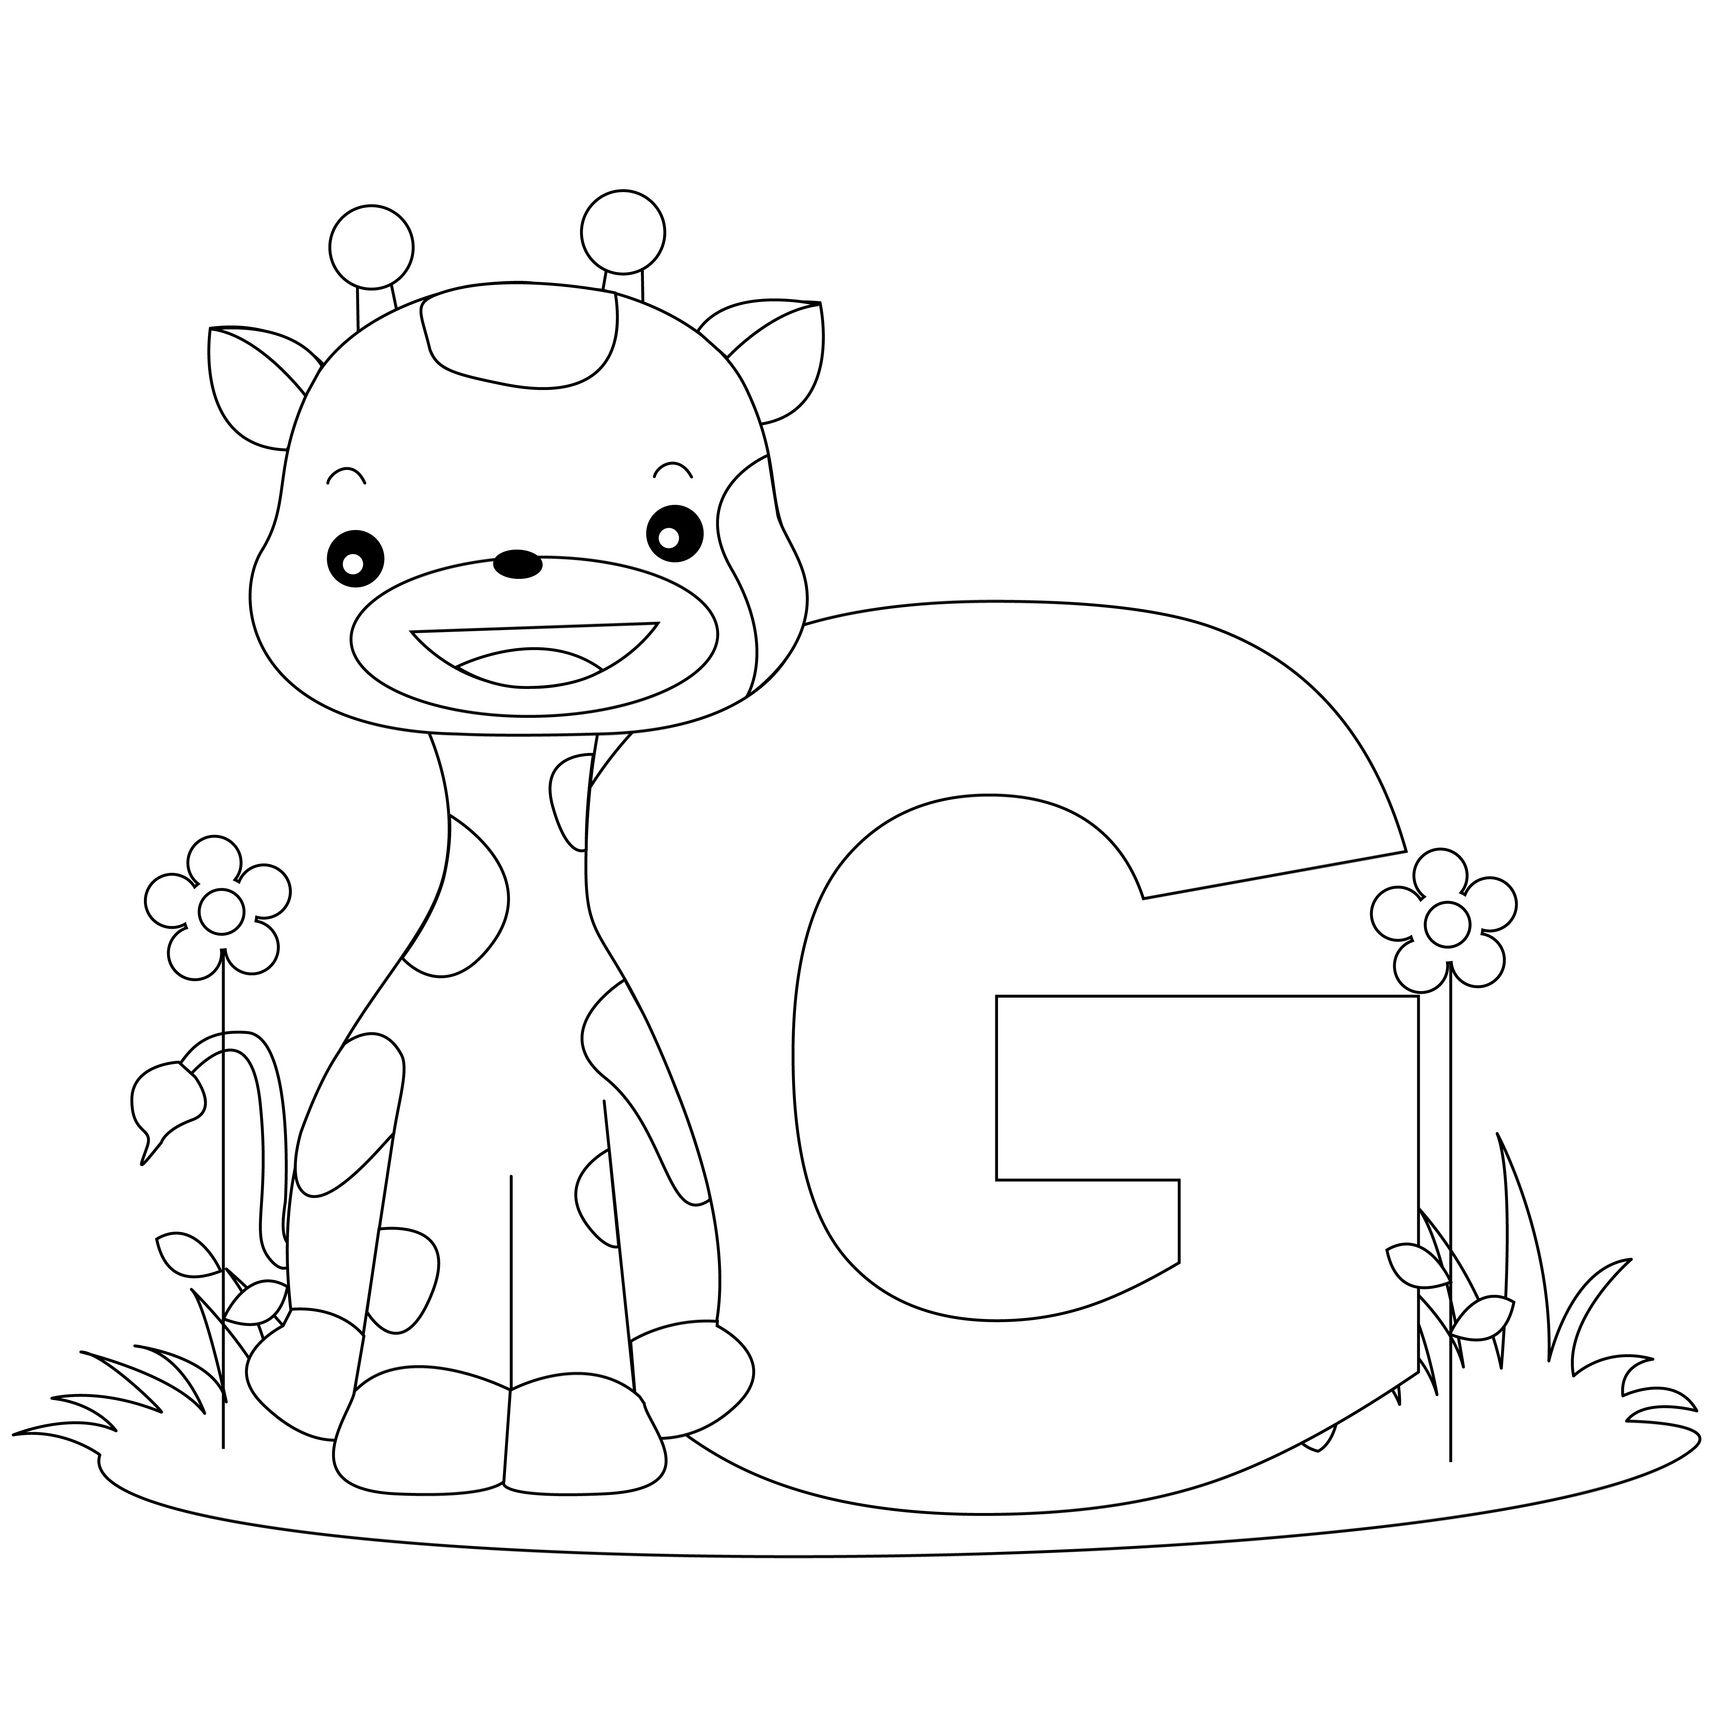 Animal Alphabet Letter G Is For Giraffe Here S A Simple